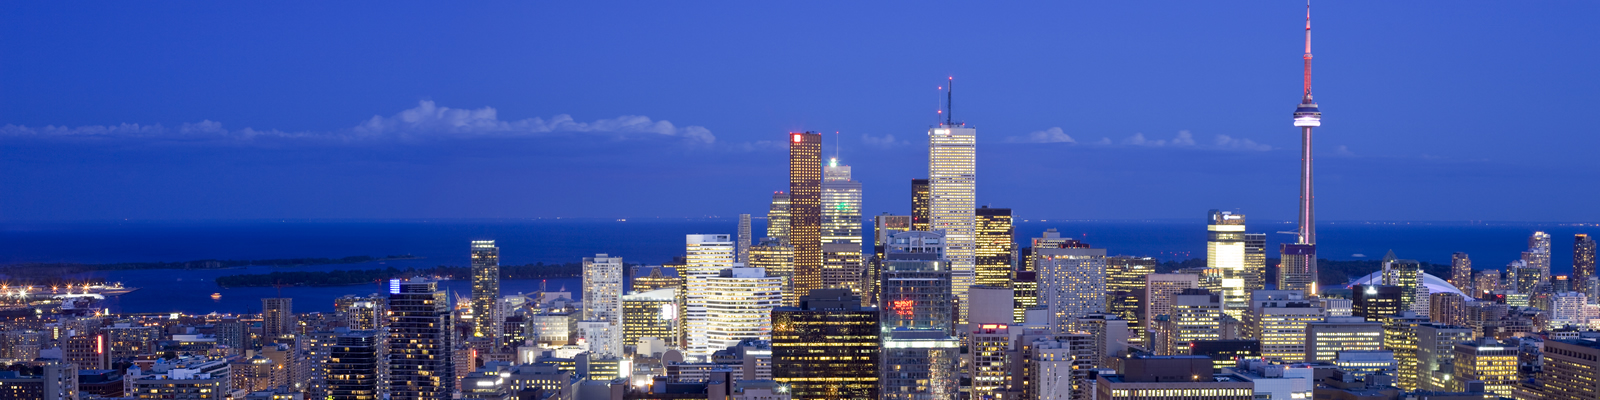 Downtown Mississauga and Toronto Condos